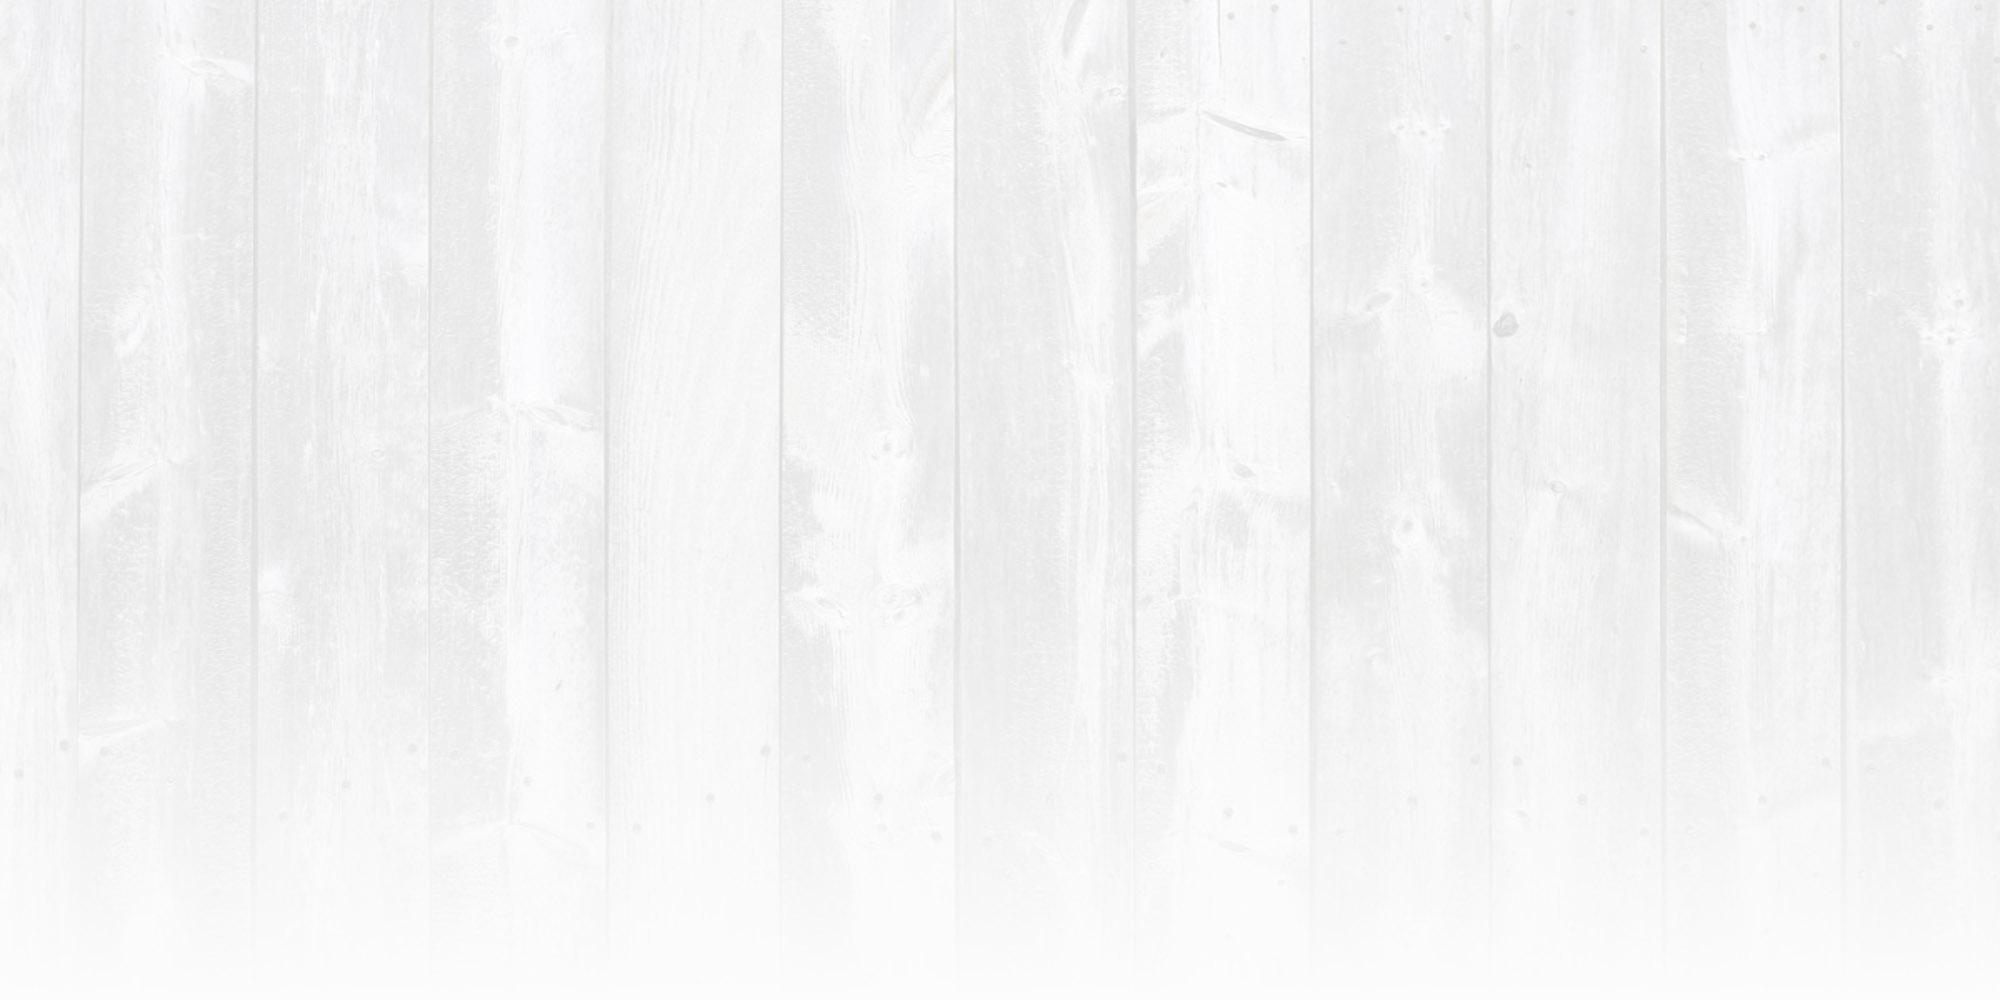 Rustic White Background- universalcouncil.info